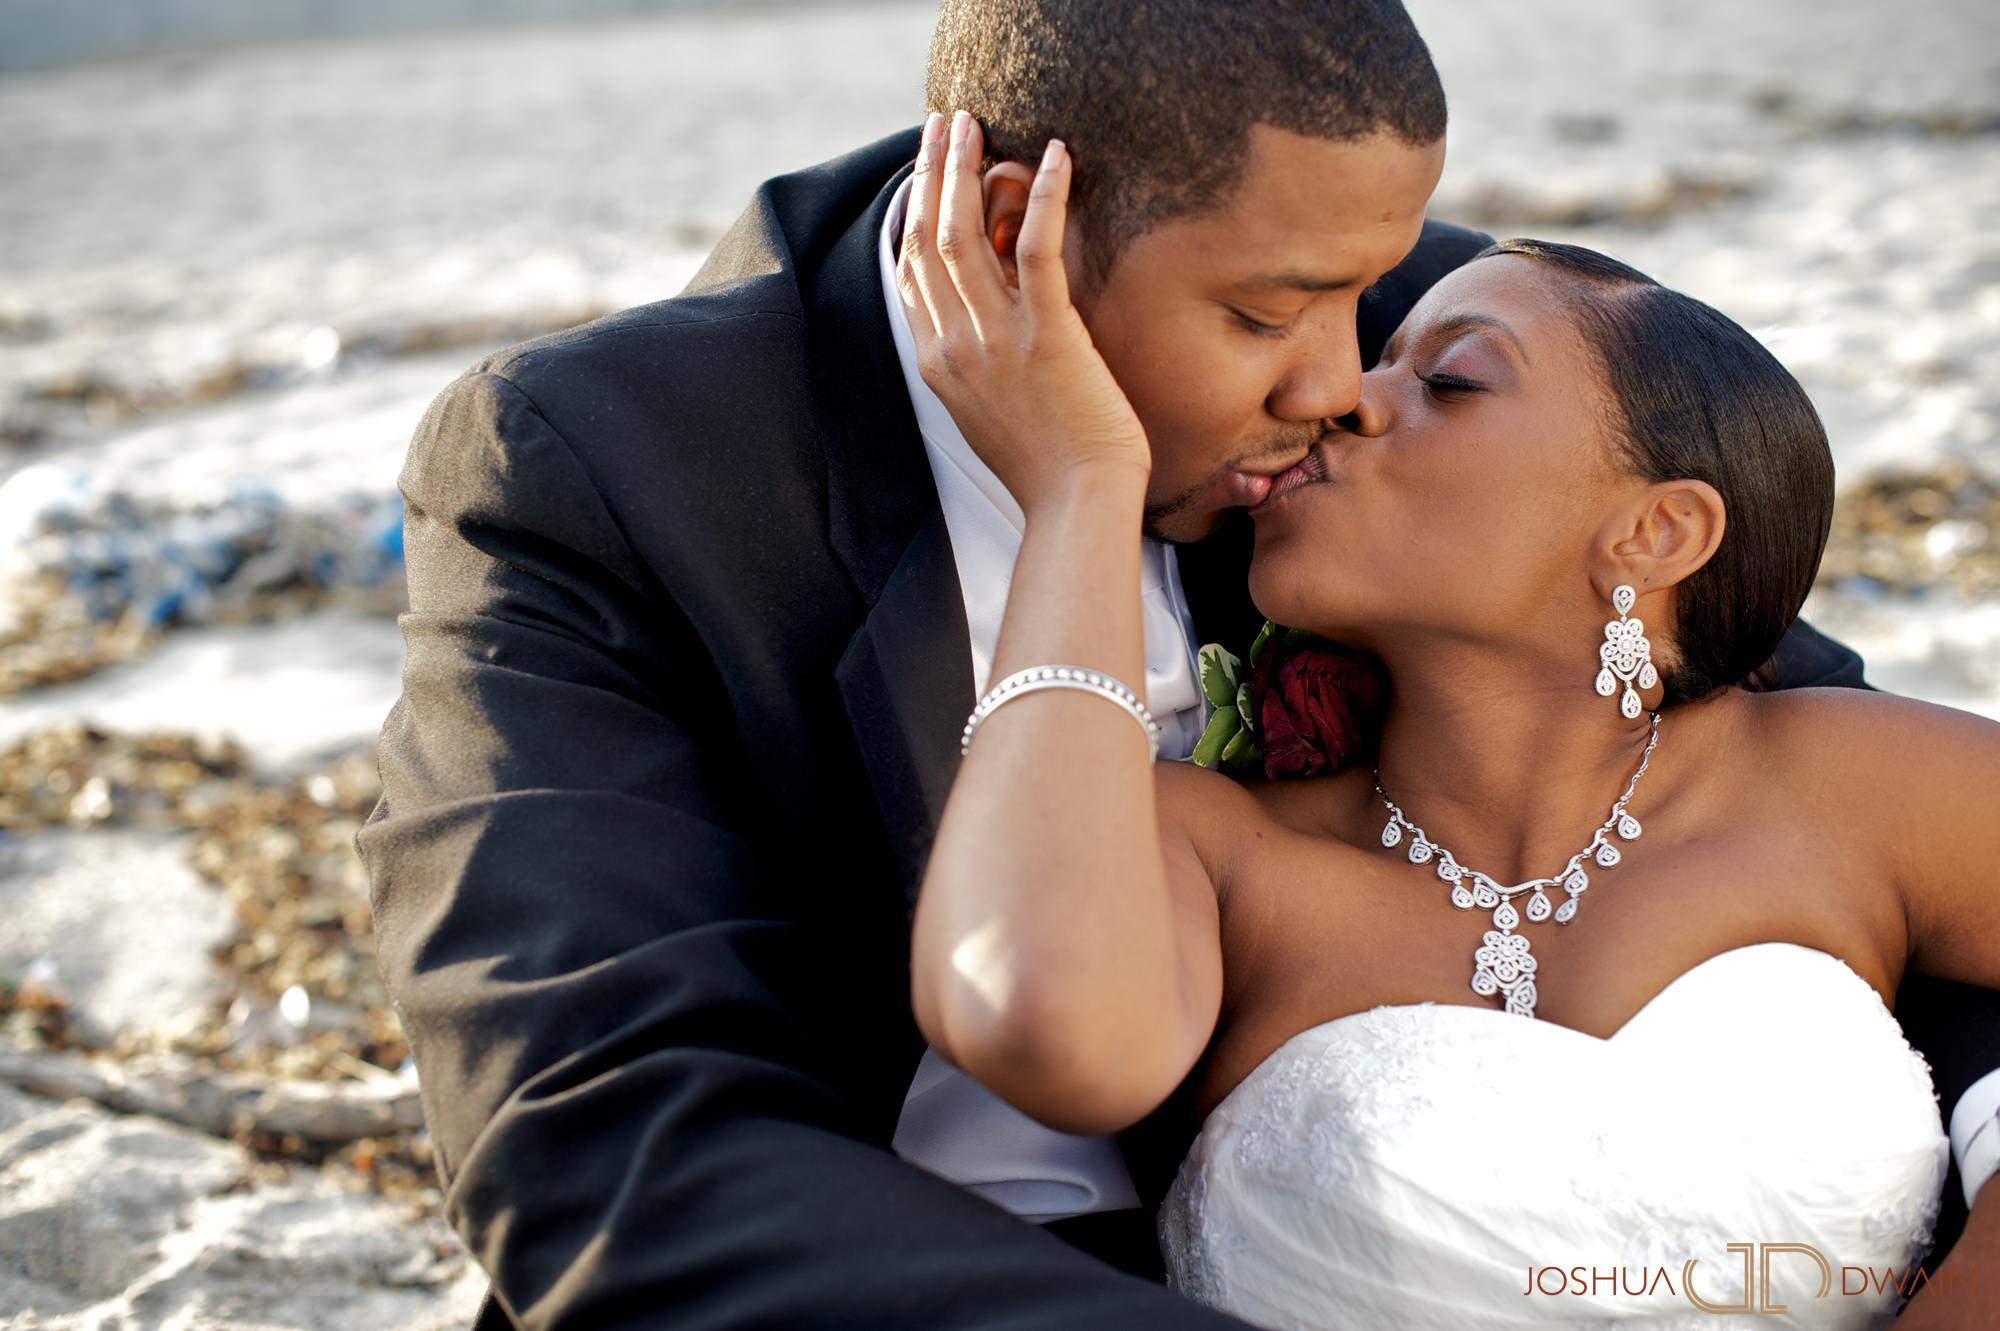 natifia-don-001-greentree-country-clubnew-rochelle-new-york-wedding-photographer-joshua-dwain-20101023_dn_1020